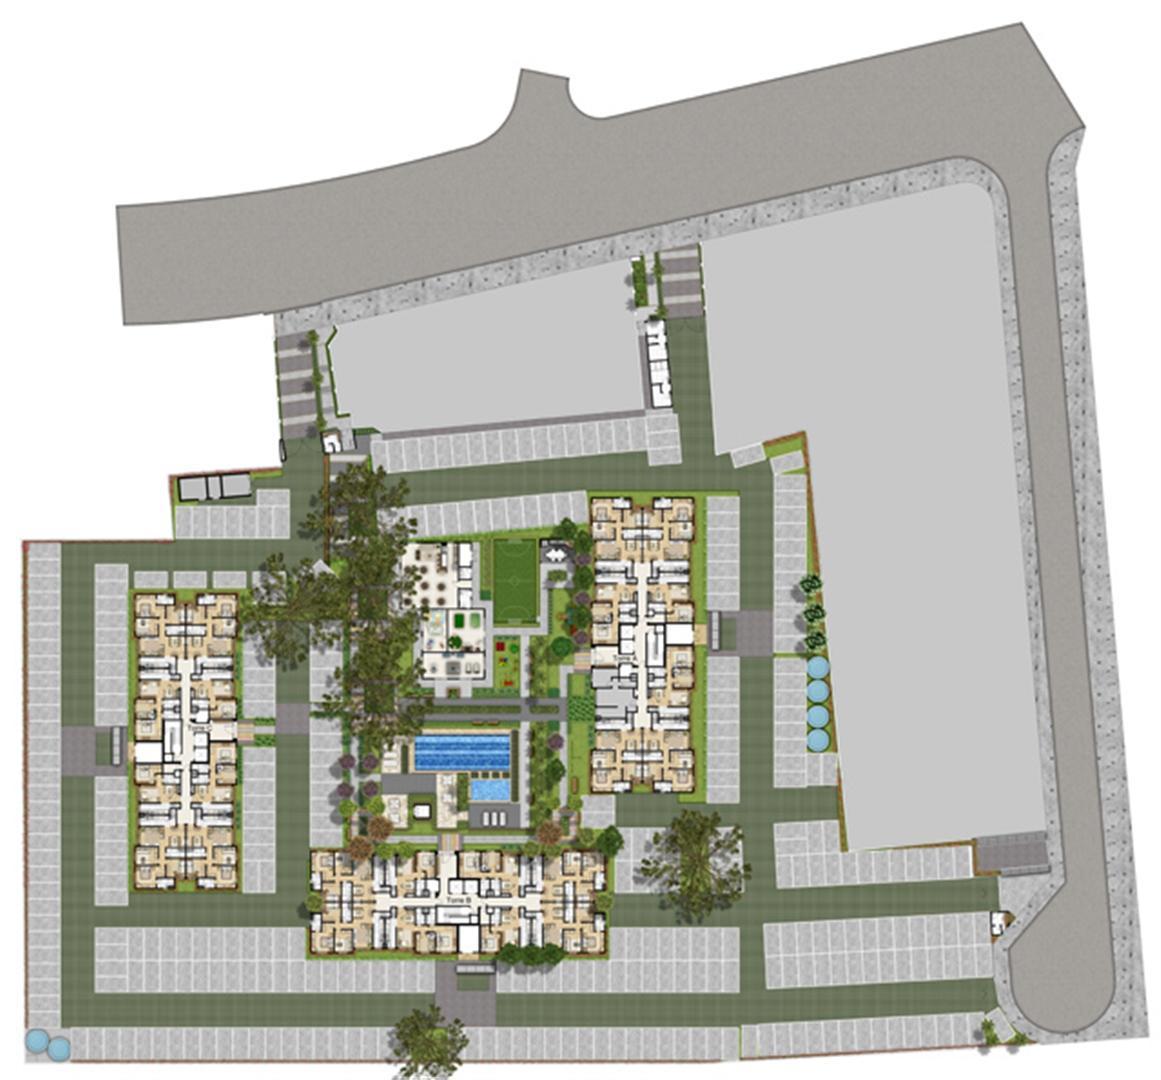 Perspectiva Ilustrada da Implantacao | Way – Apartamento no  Partenon - Porto Alegre - Rio Grande do Sul